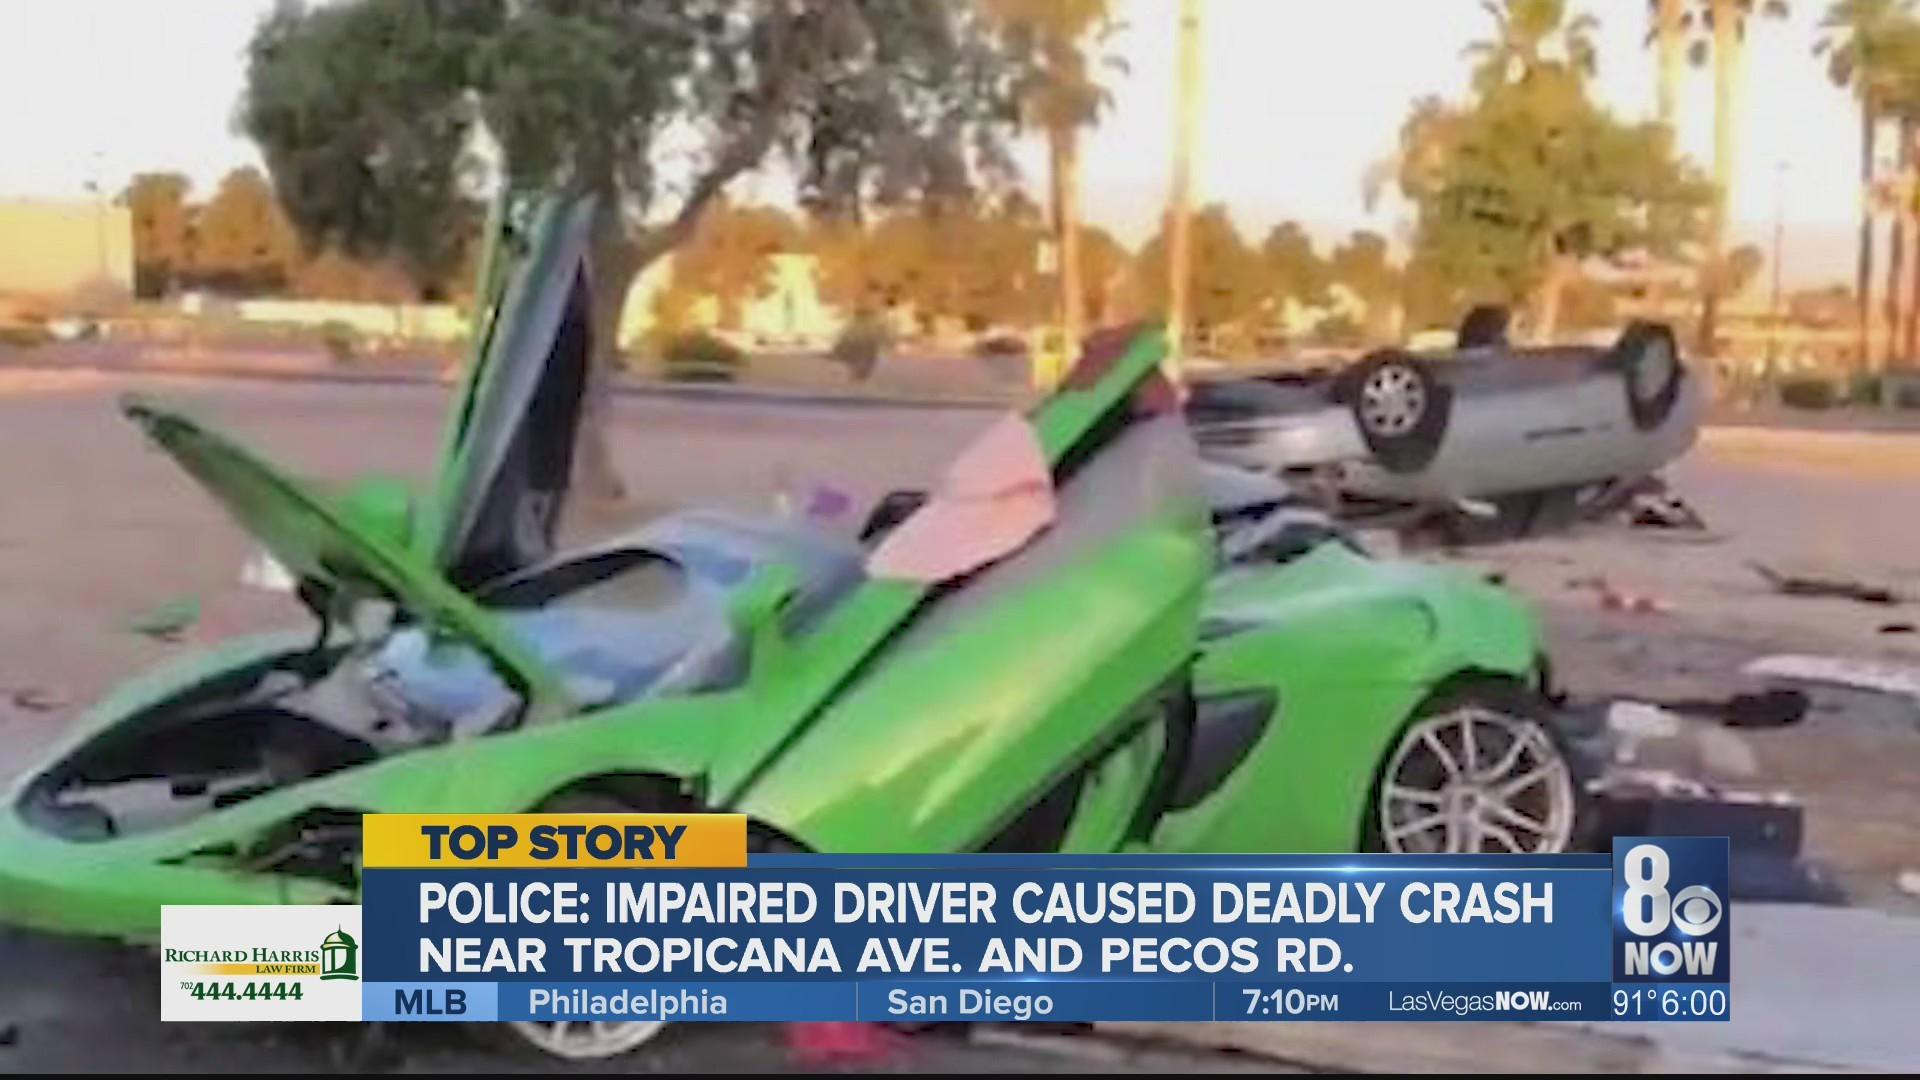 Coroner ID's man killed in DUI crash involving sports car